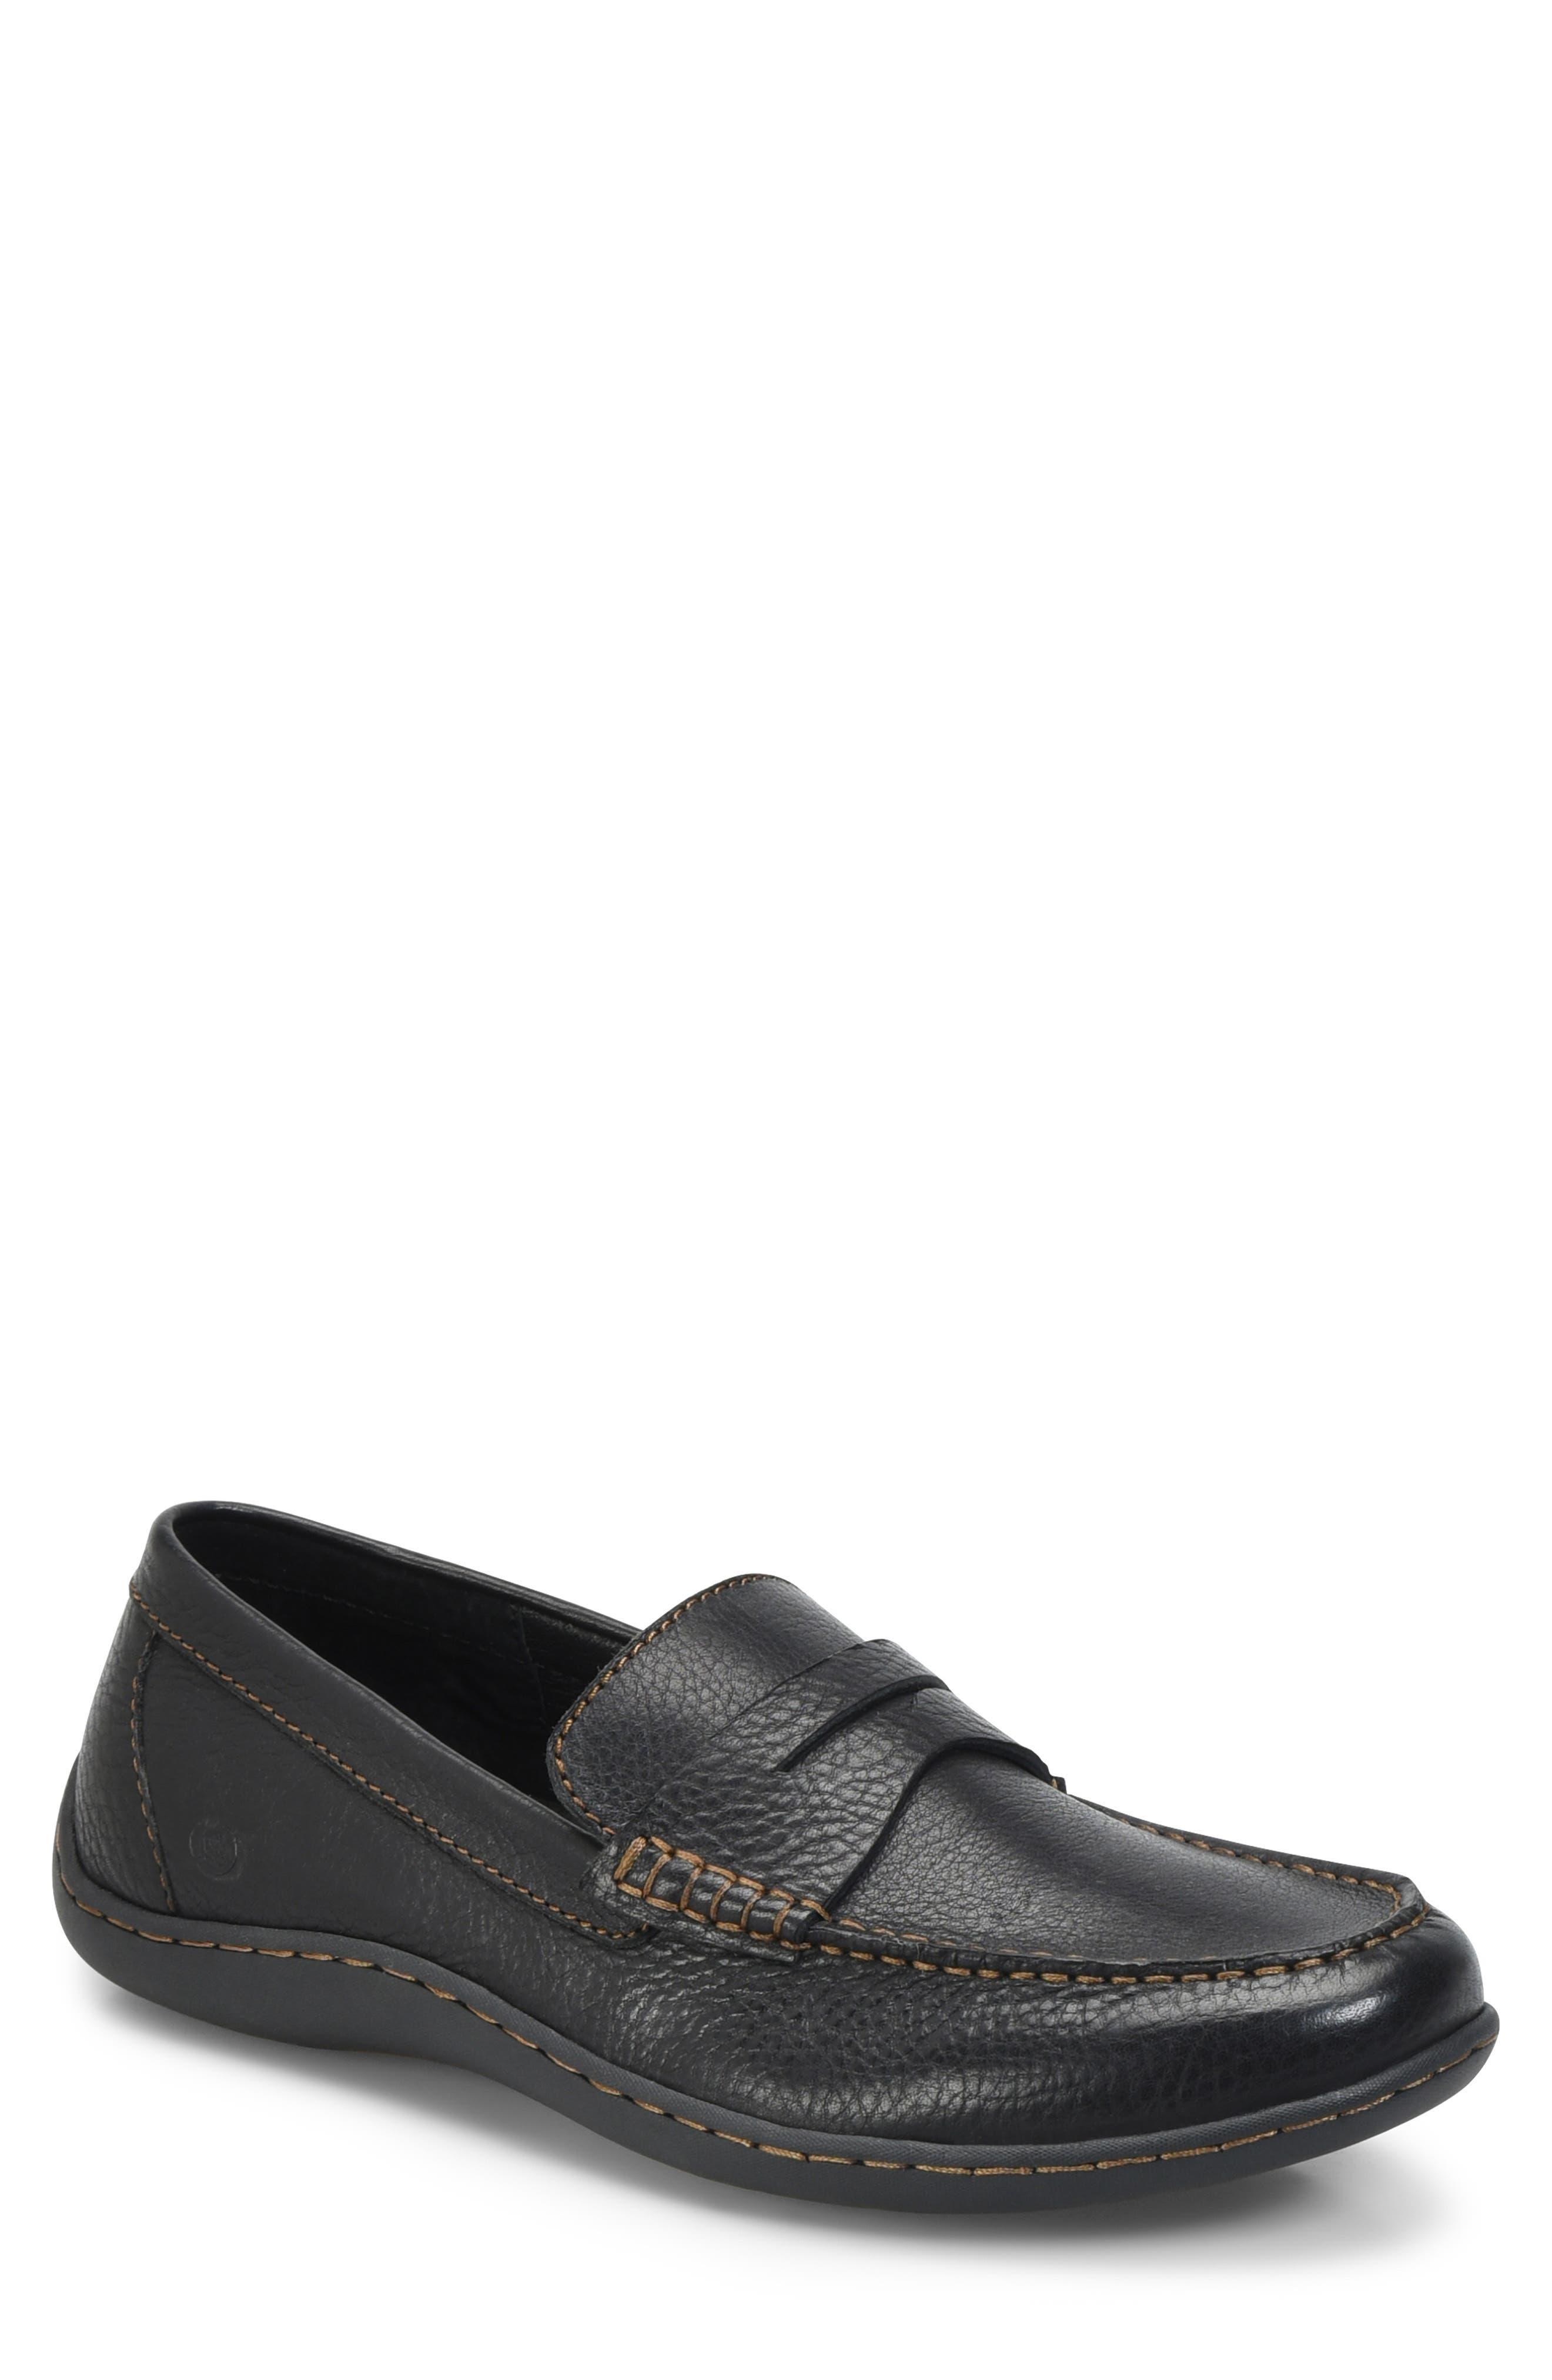 Simon II Driving Shoe,                         Main,                         color, BLACK LEATHER